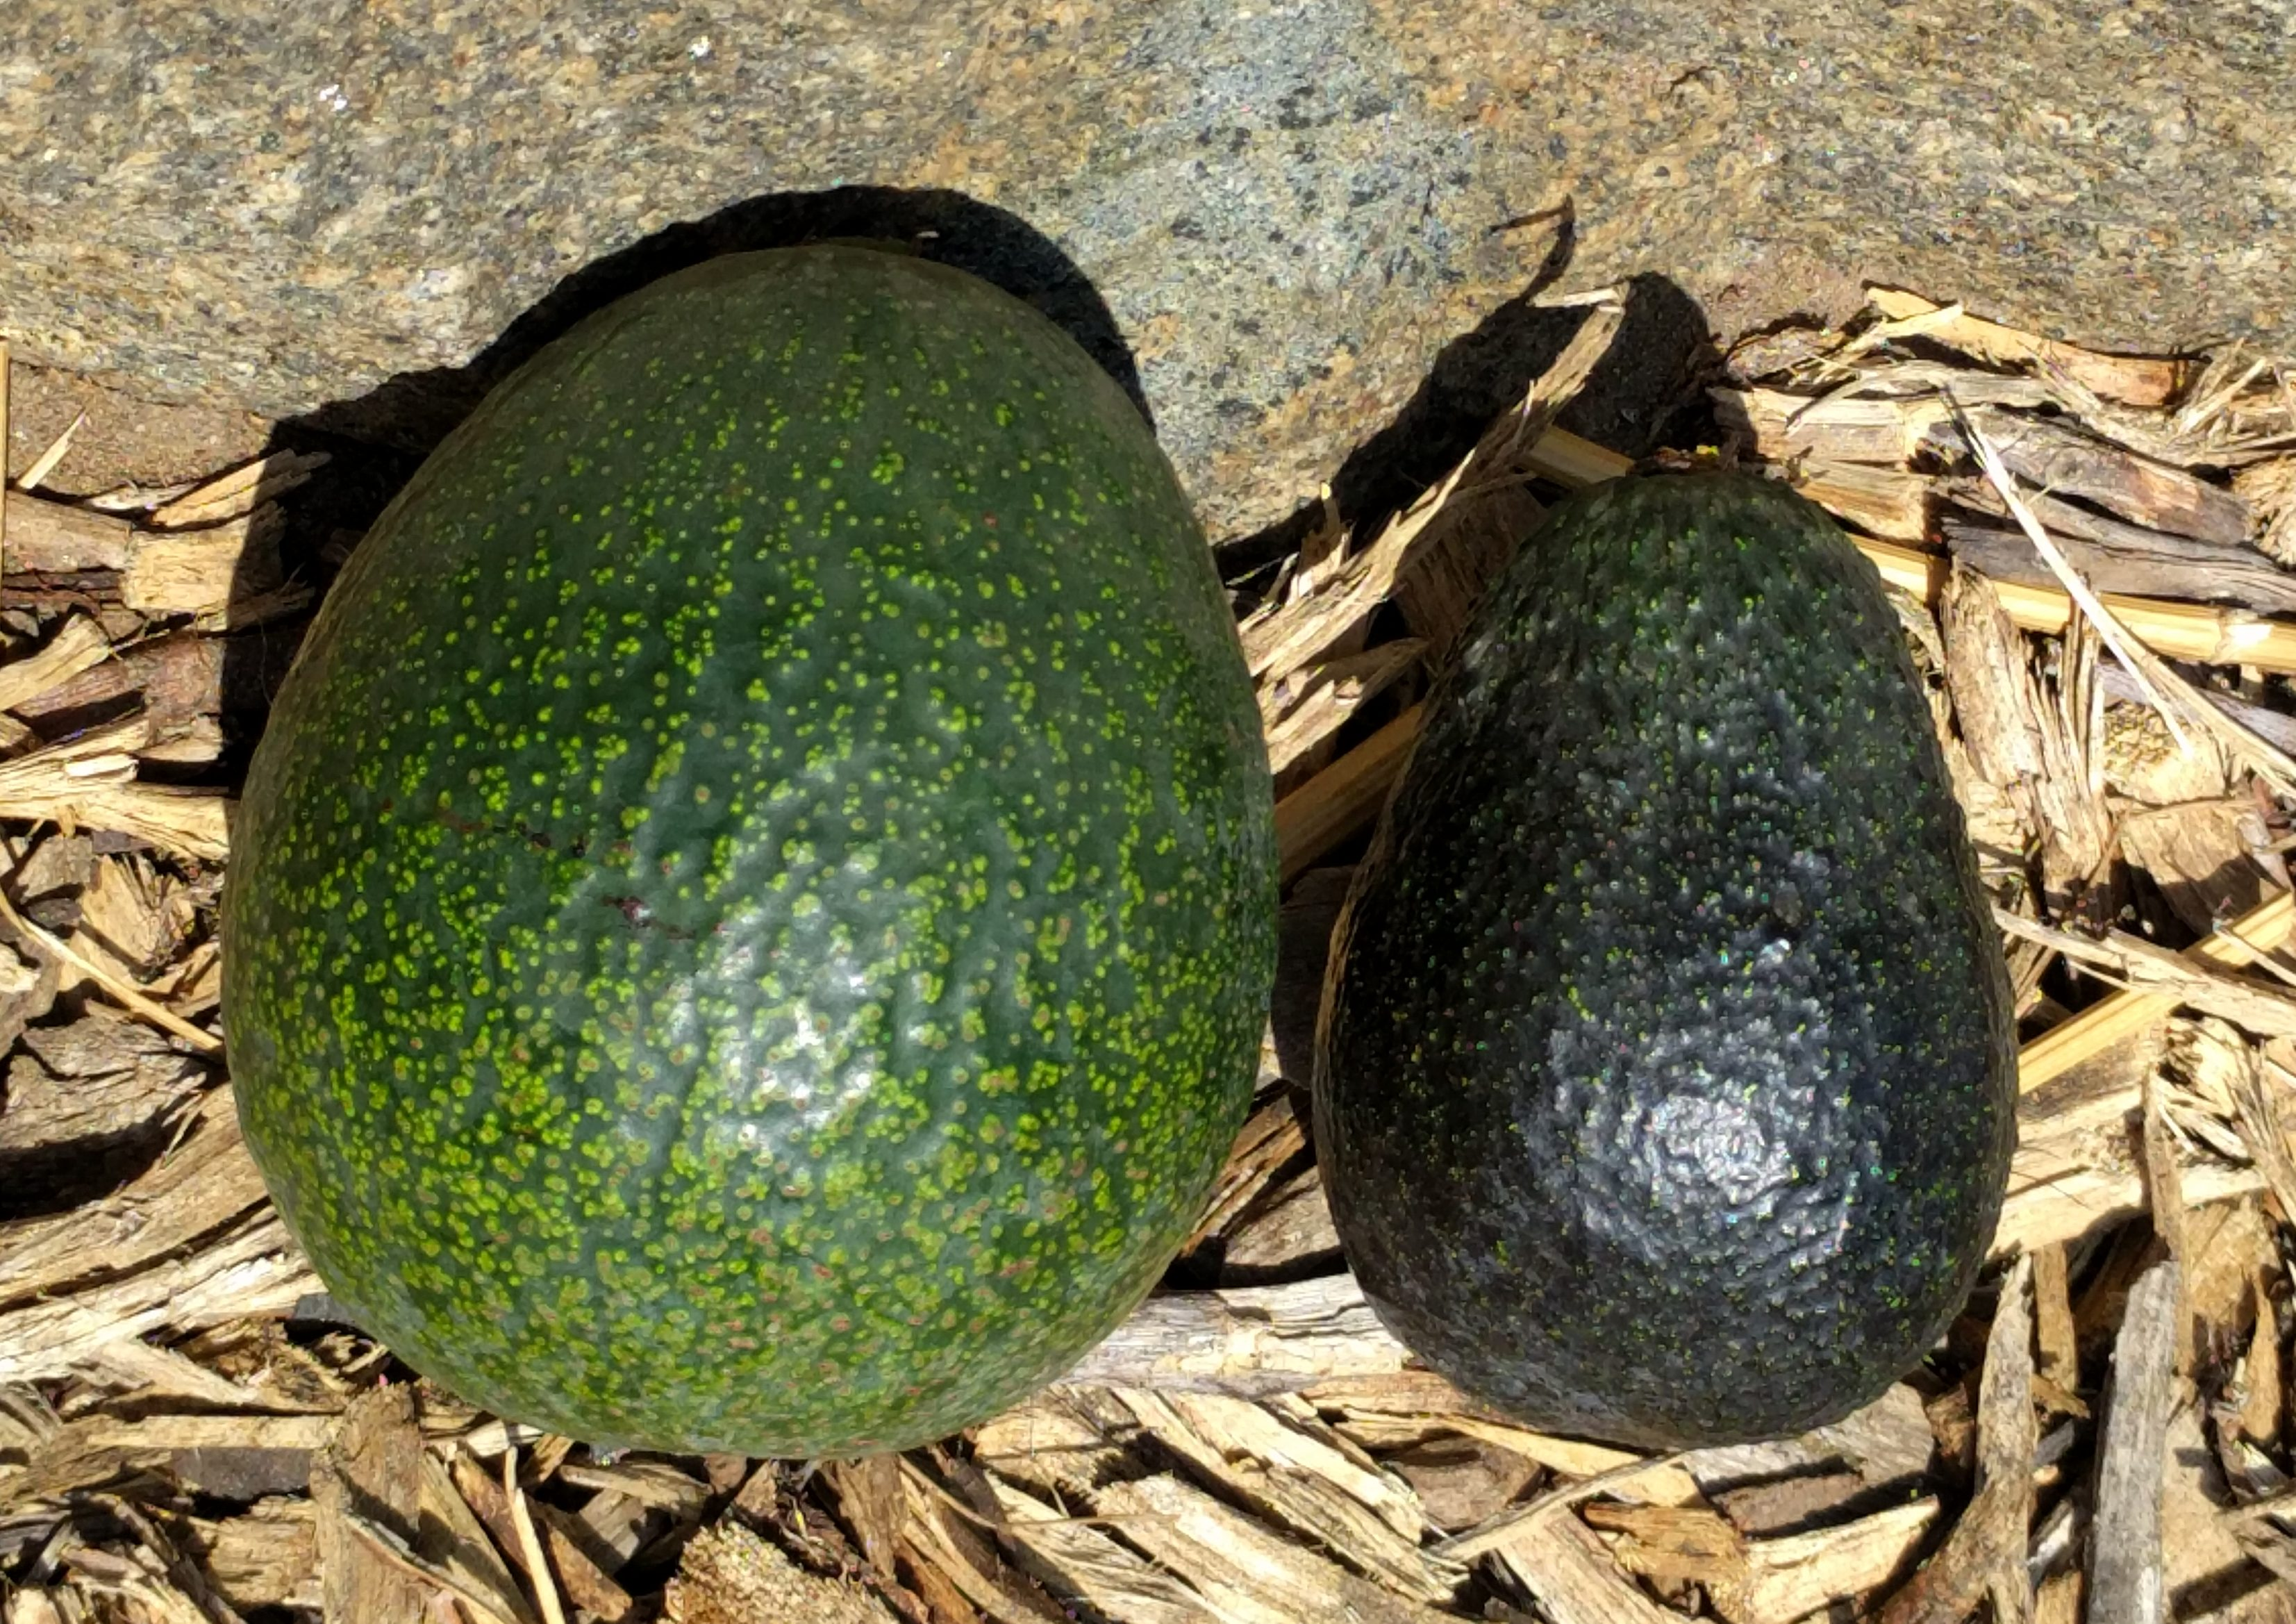 Growing avocados in Southern California - Greg Alder's Yard